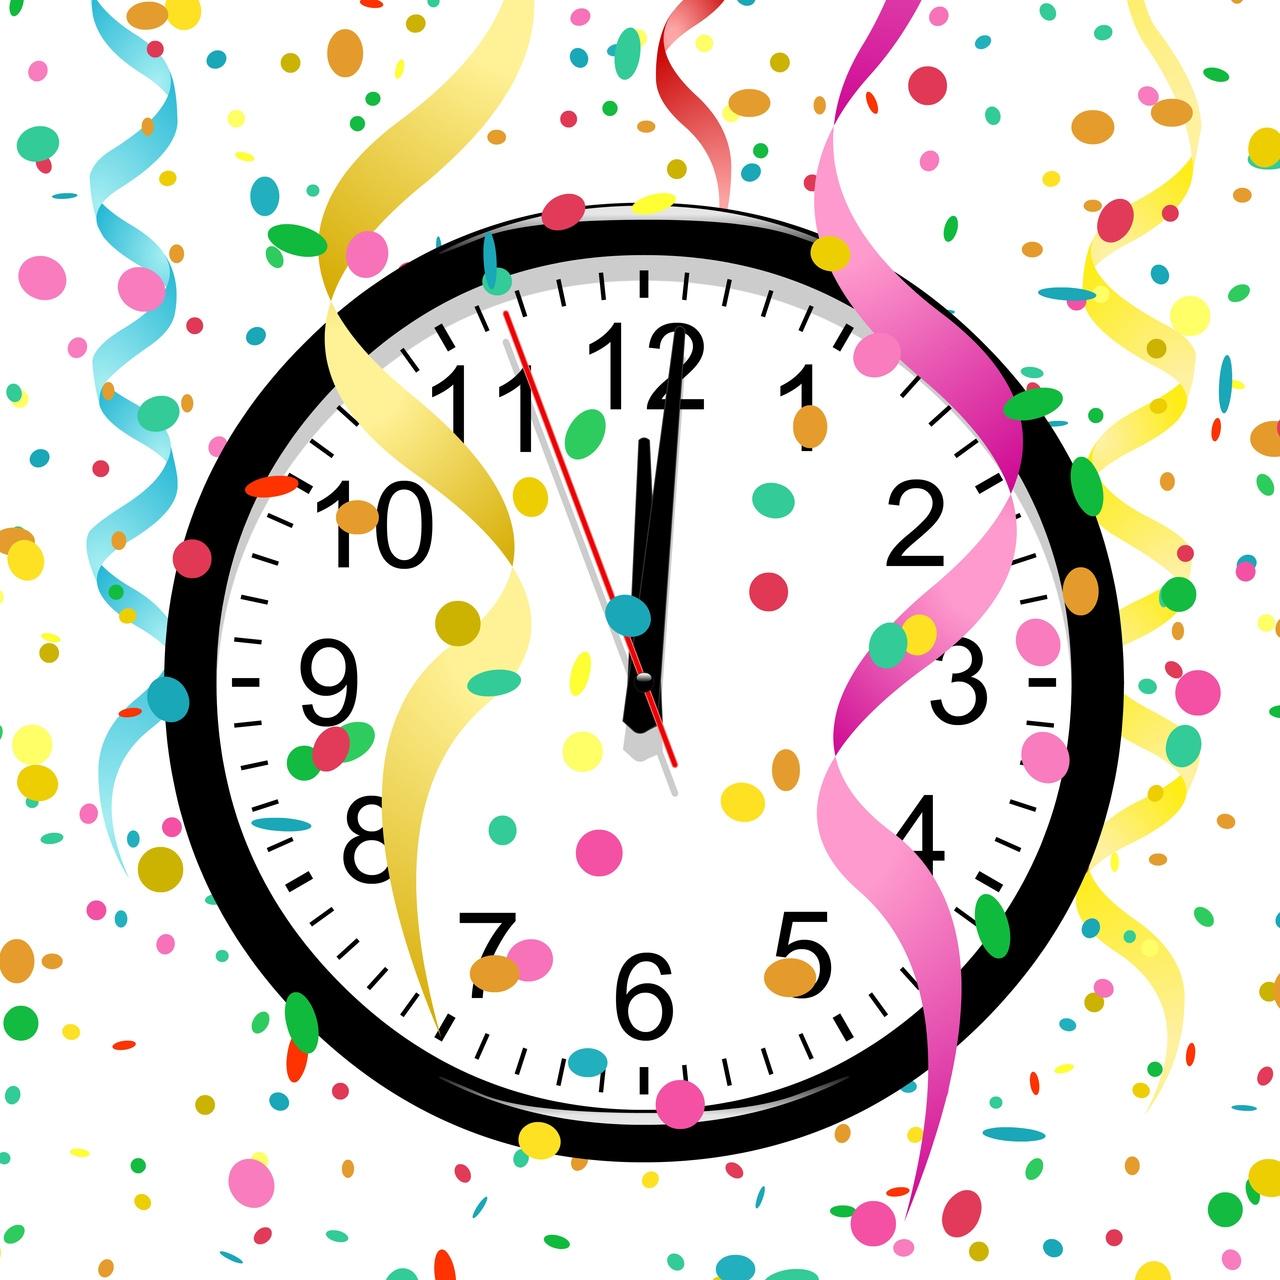 New Year Celebration Clipart 1-new year celebration clipart 1-16